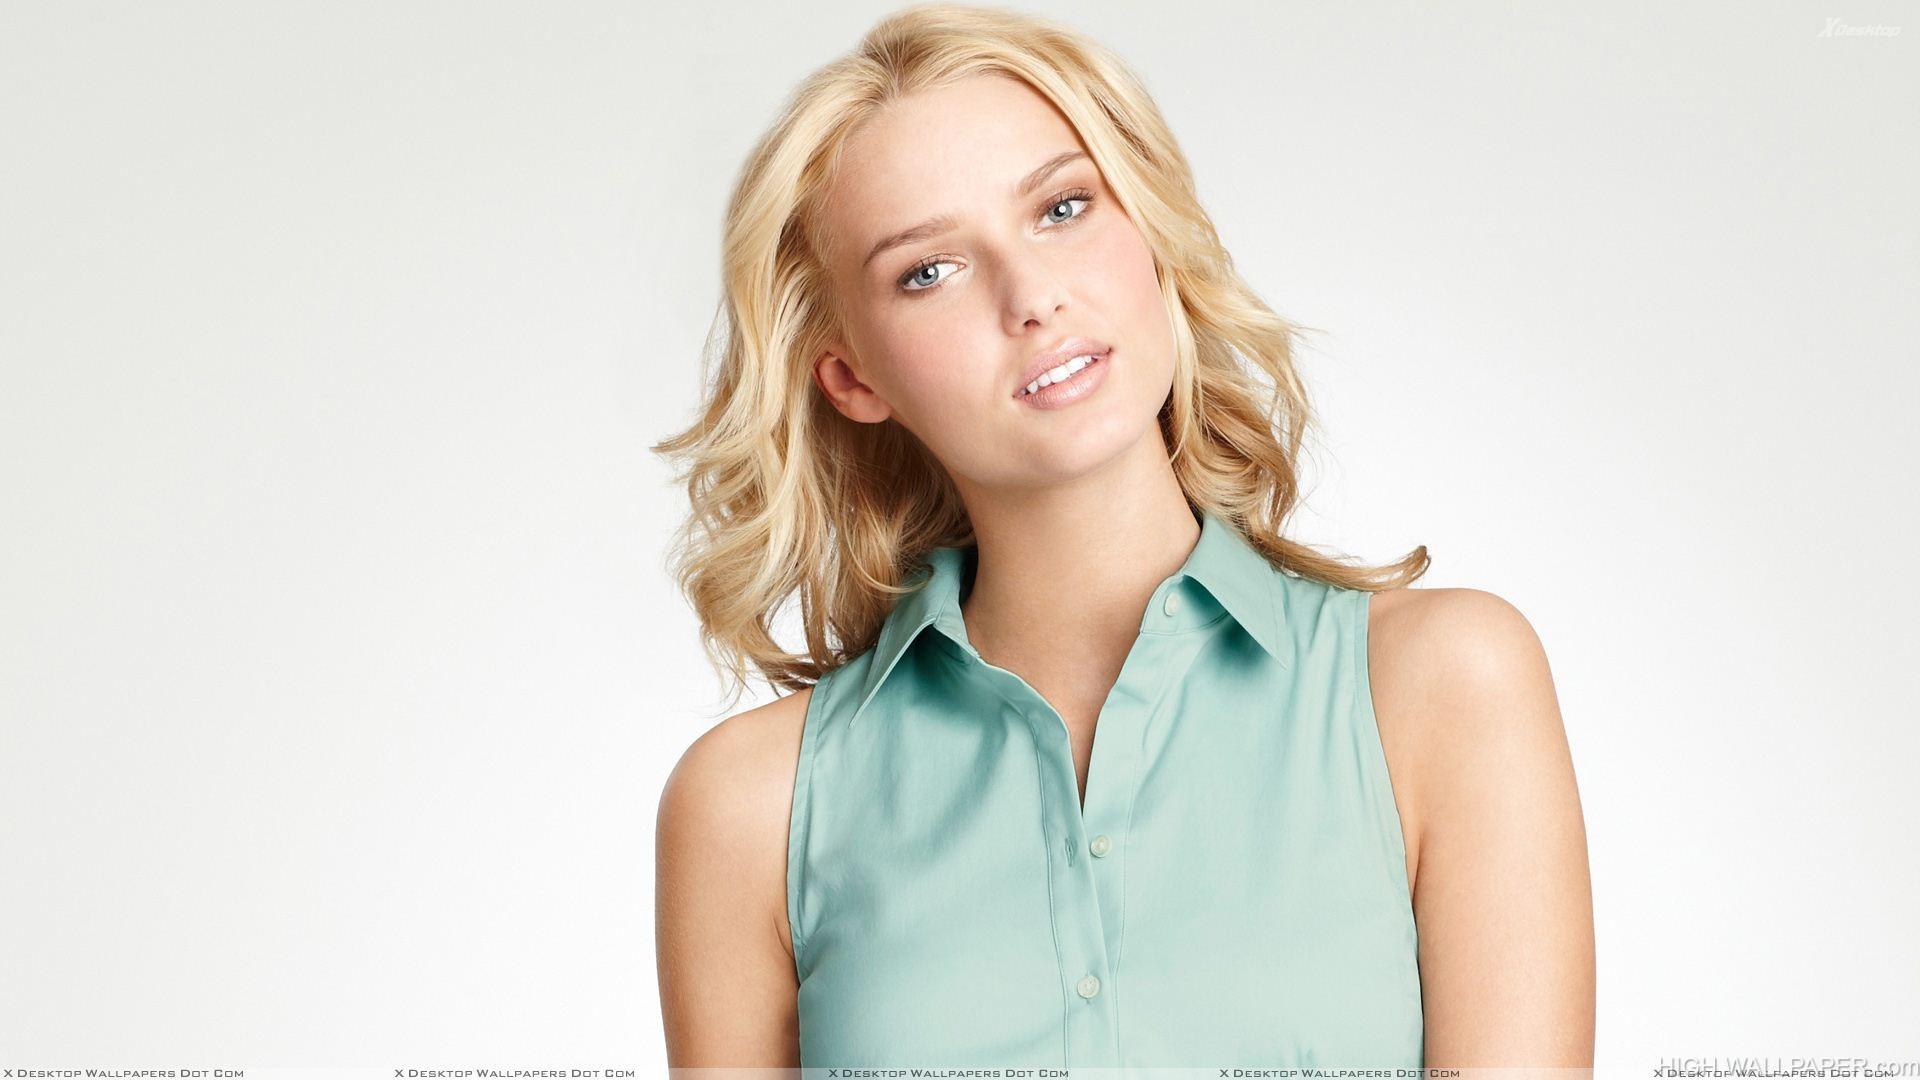 Adriana Cernanova In Blue Top N Golden Hairs